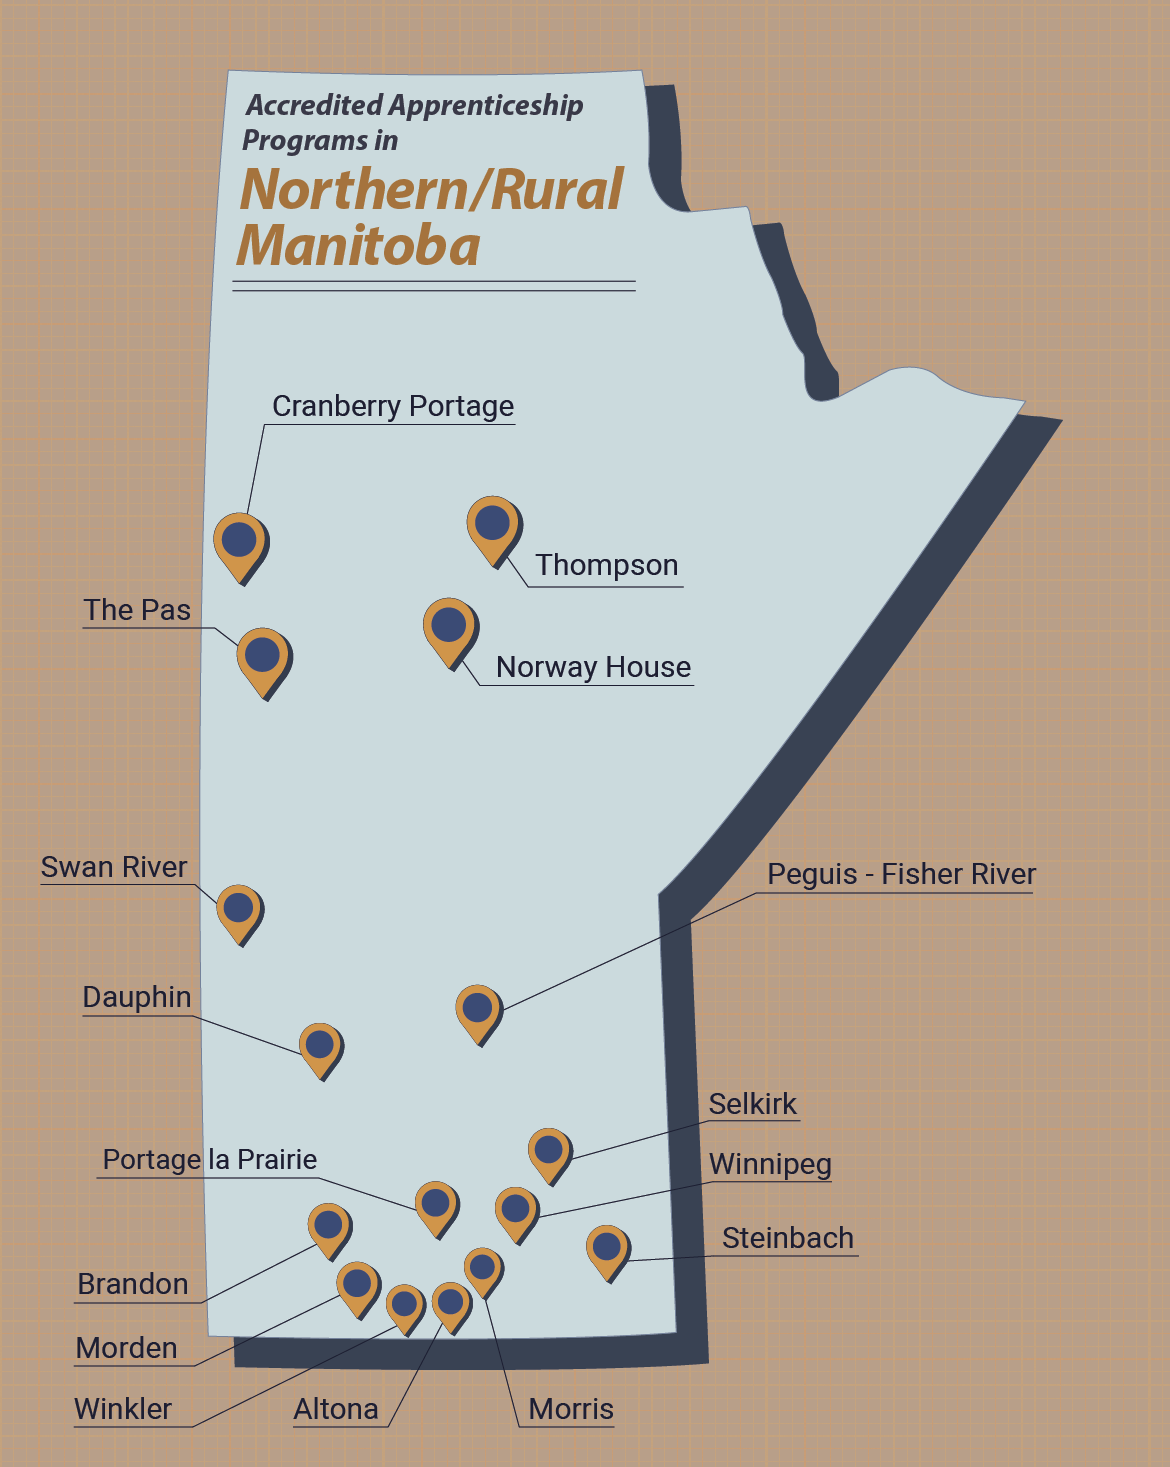 Accredited Apprenticeship Programs in Northern/Rural Manitoba